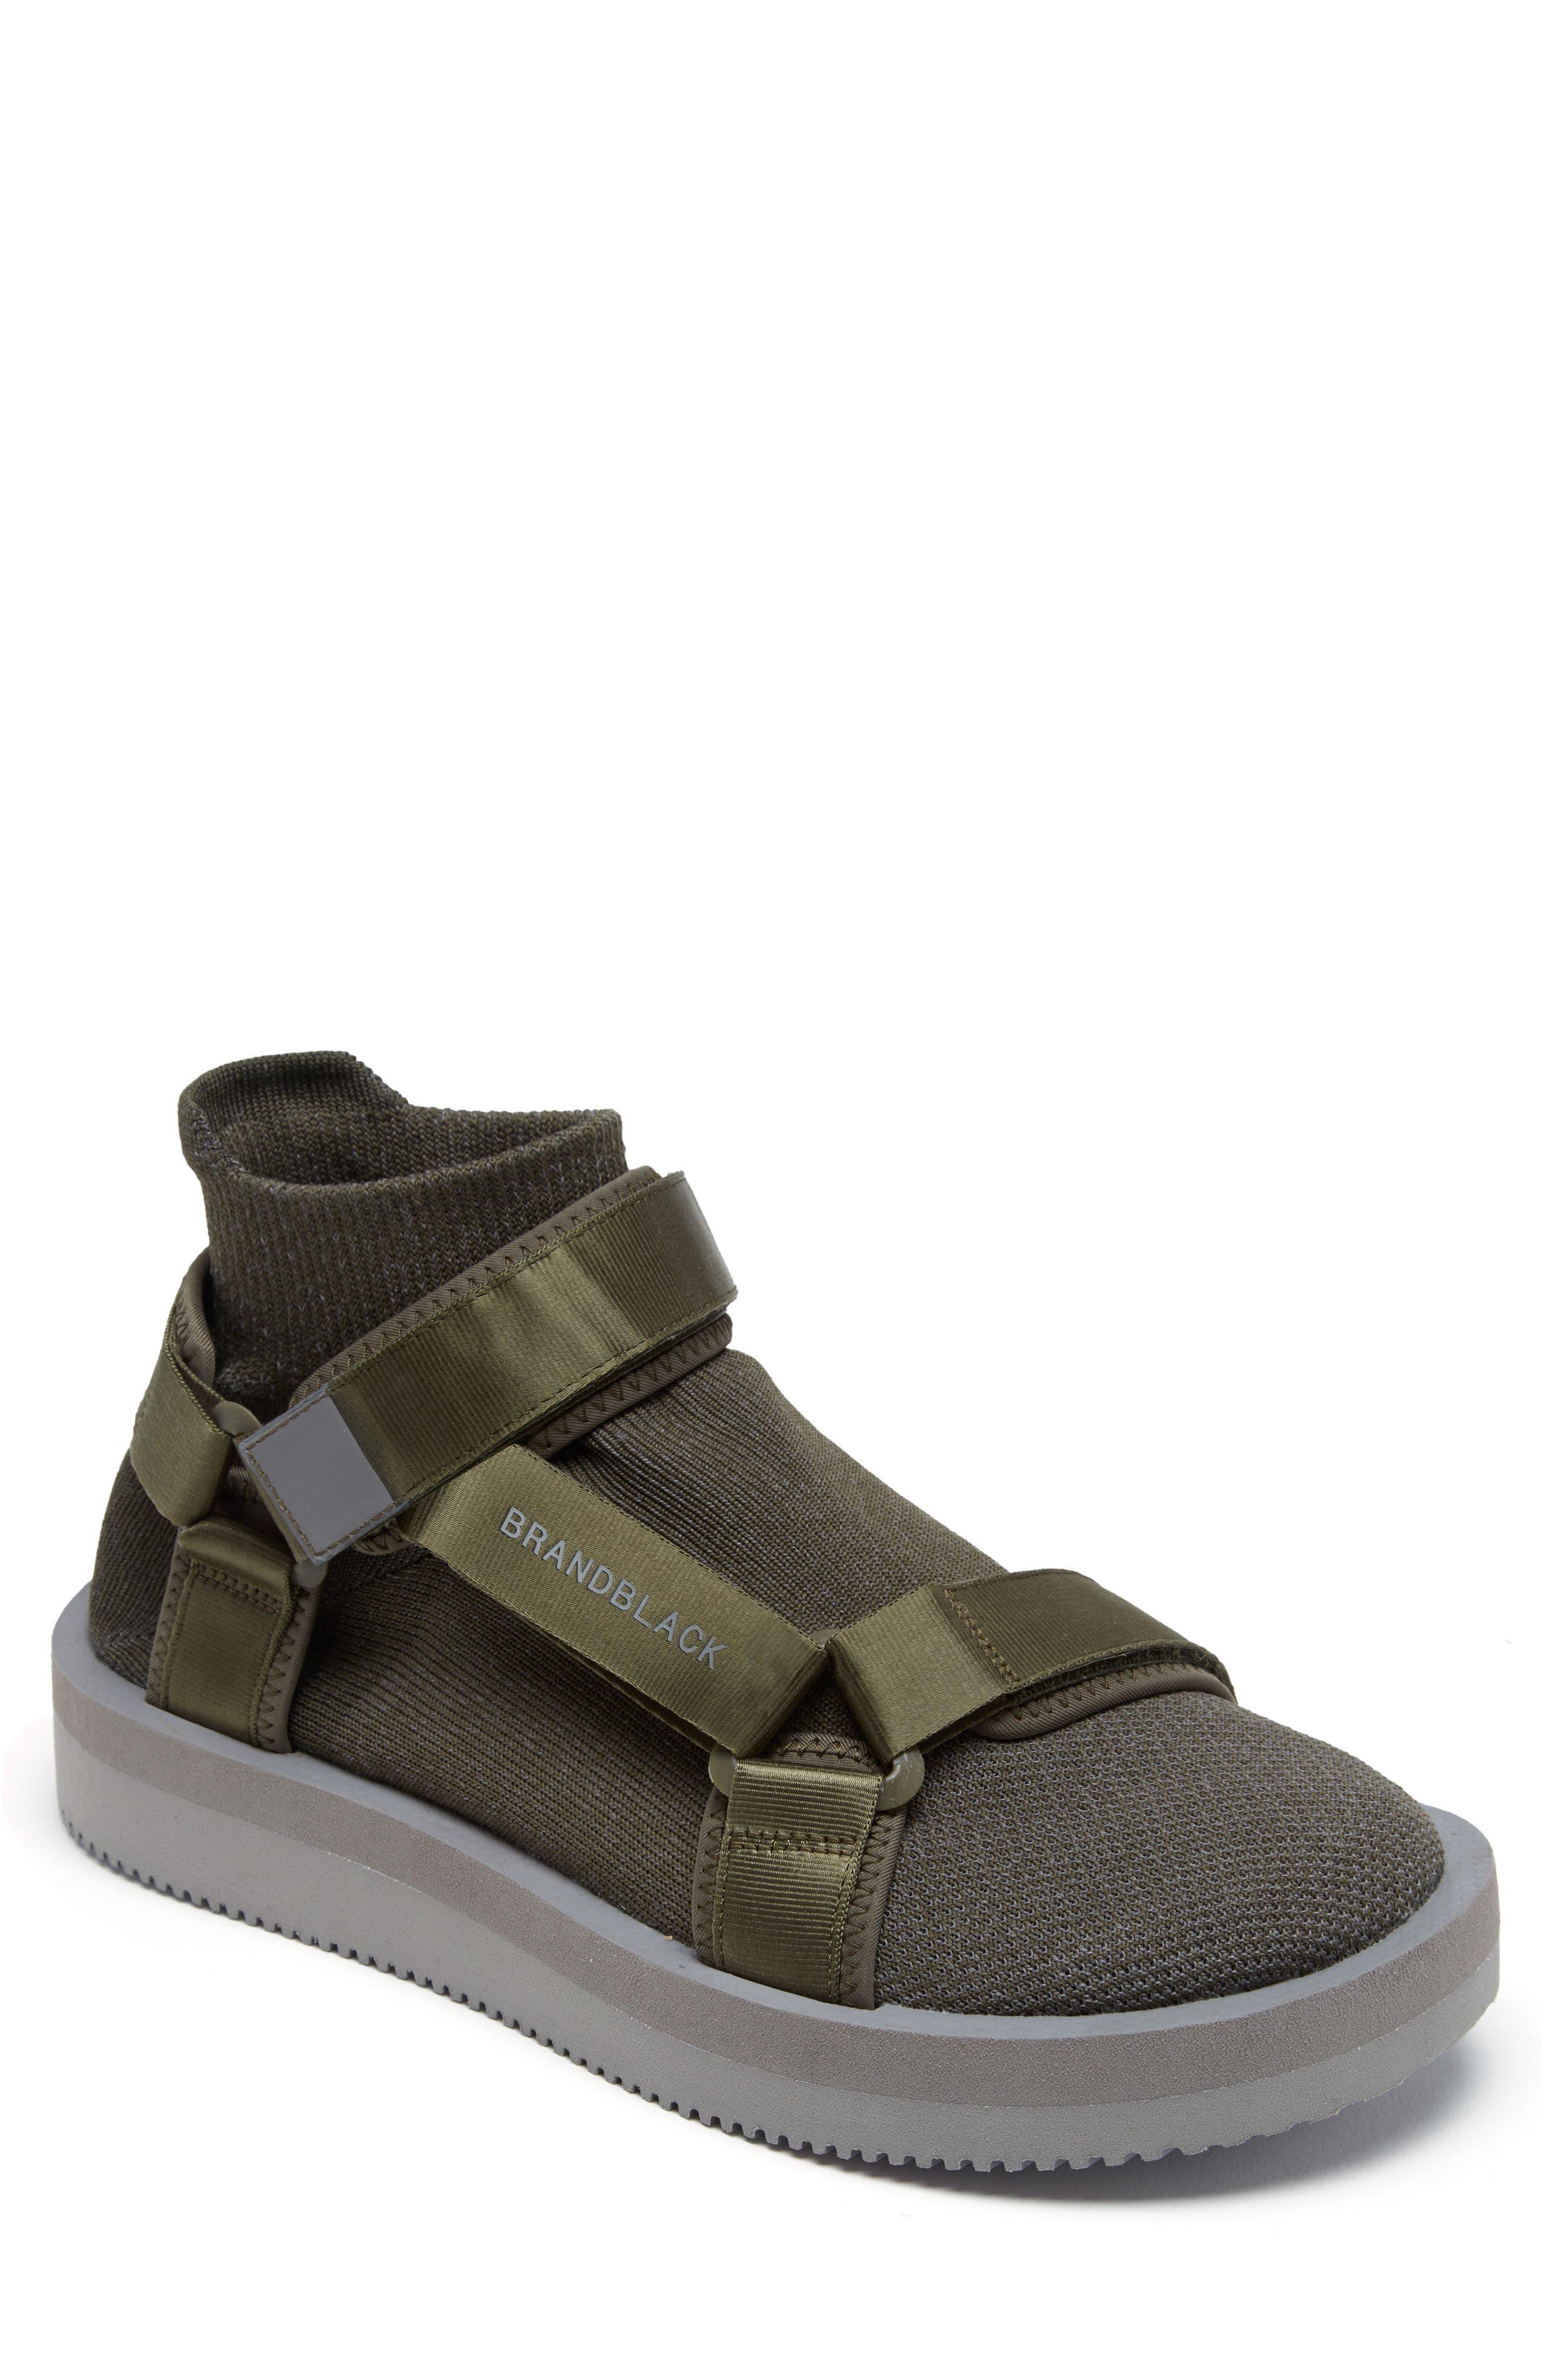 Tabi Sandal,                         Main,                         color, OLIVE/ GRAY